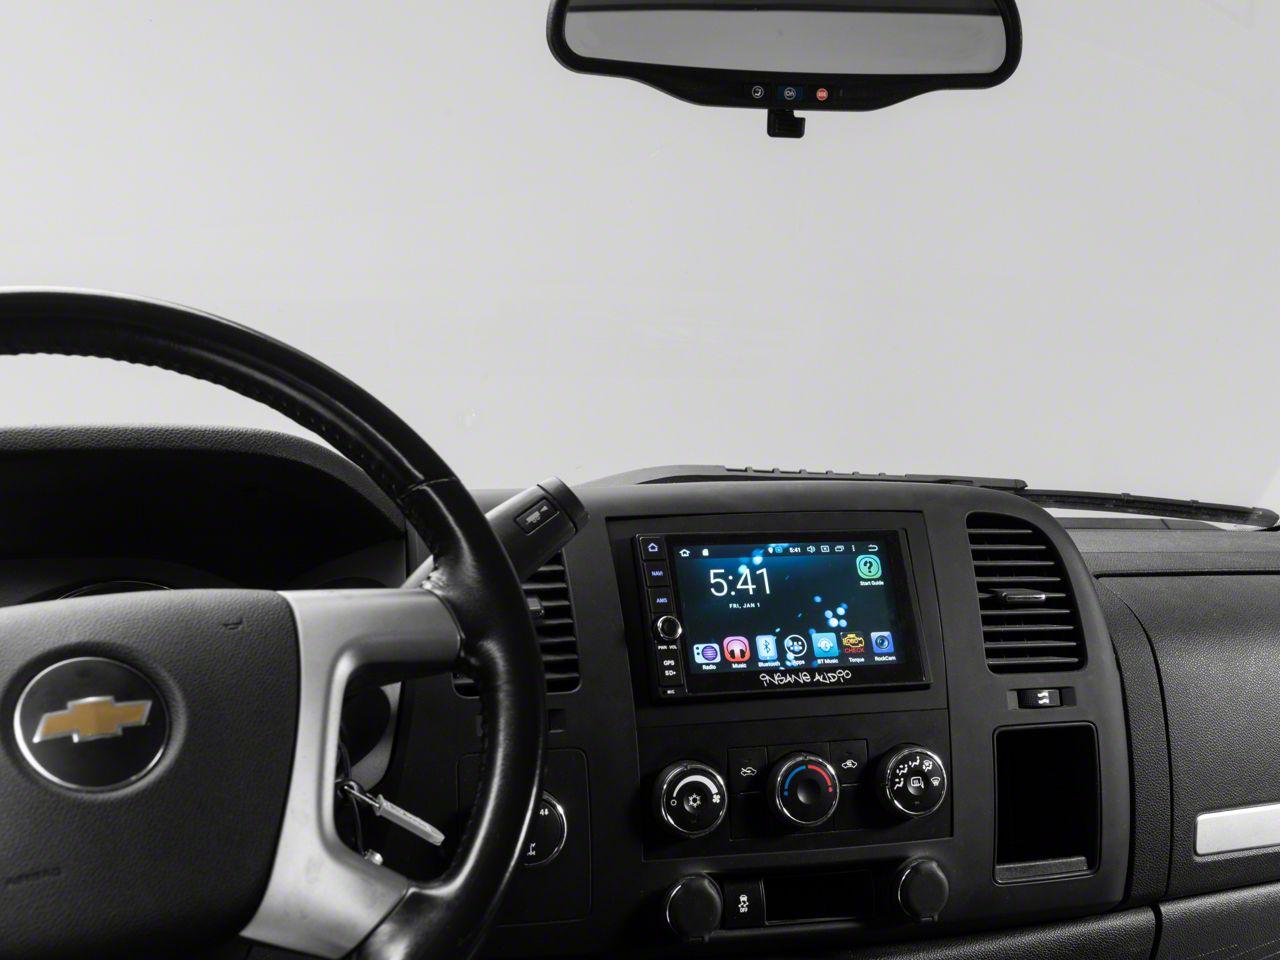 Insane Audio Plug & Play Navigation Unit (07-13 Silverado 1500)